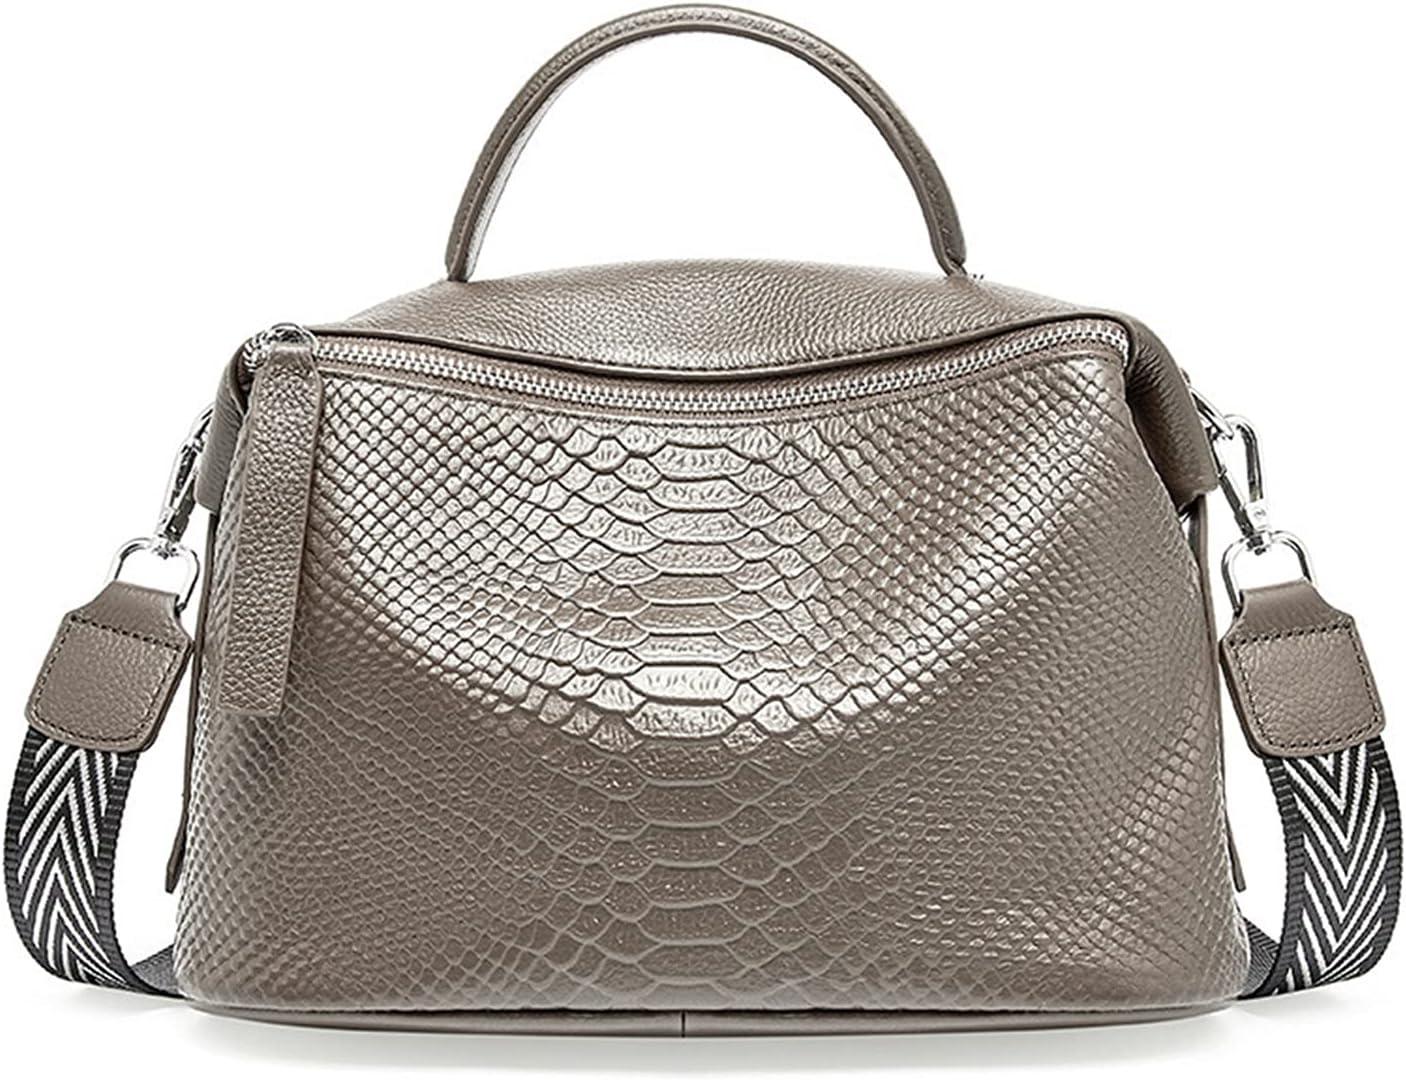 Genuine Leather Crocodile Pattern Max 66% OFF Women's Handbag Boston price Bag Sho